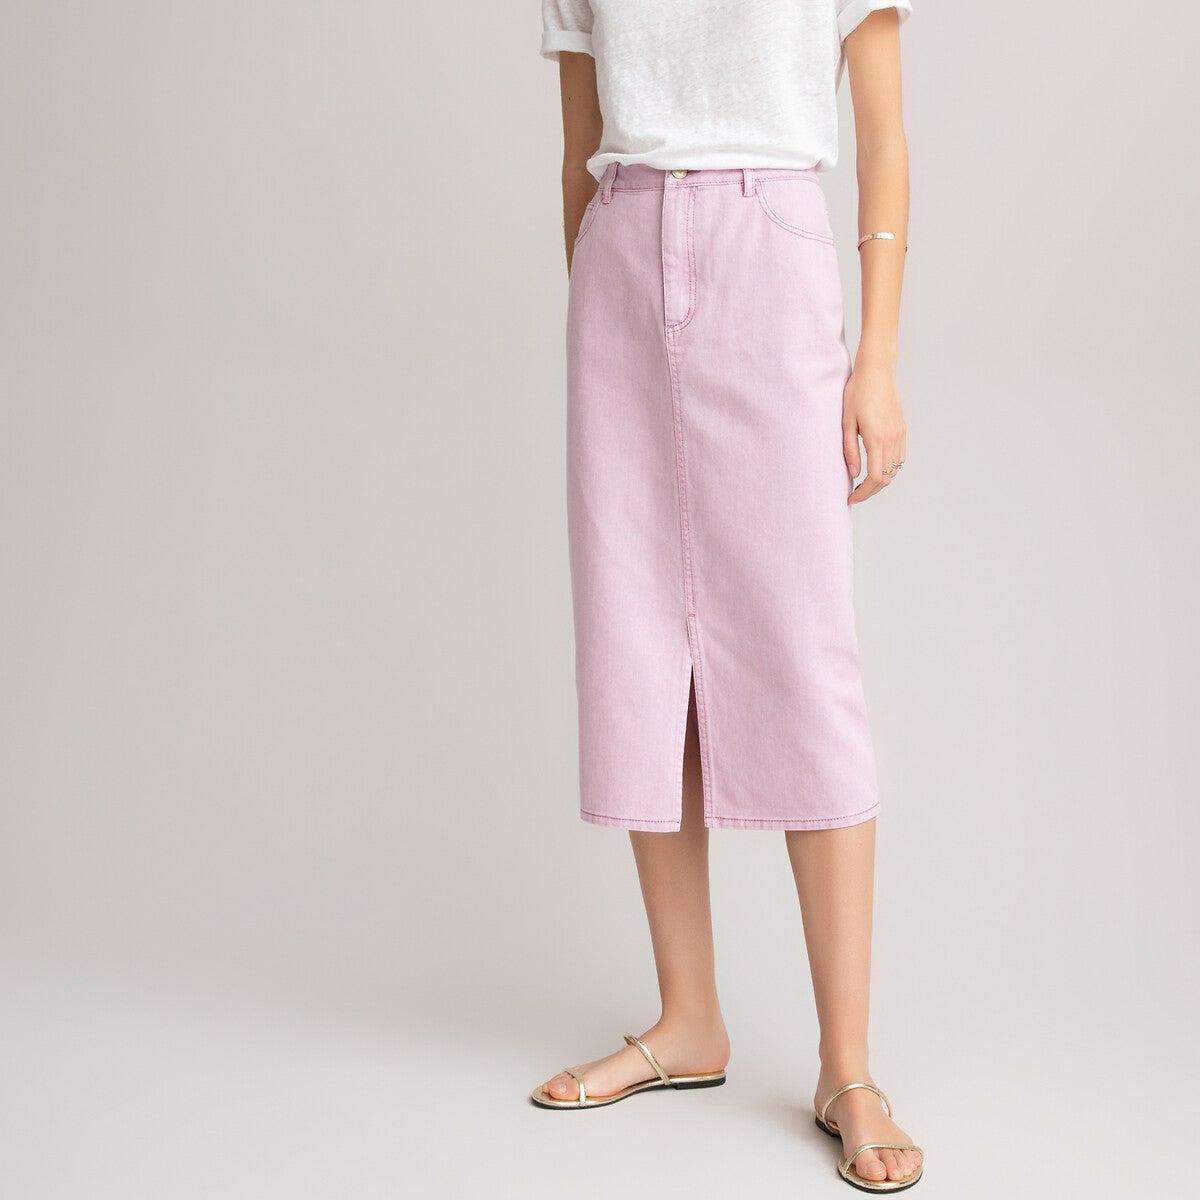 Falda recta de algodón orgánico, largo midi